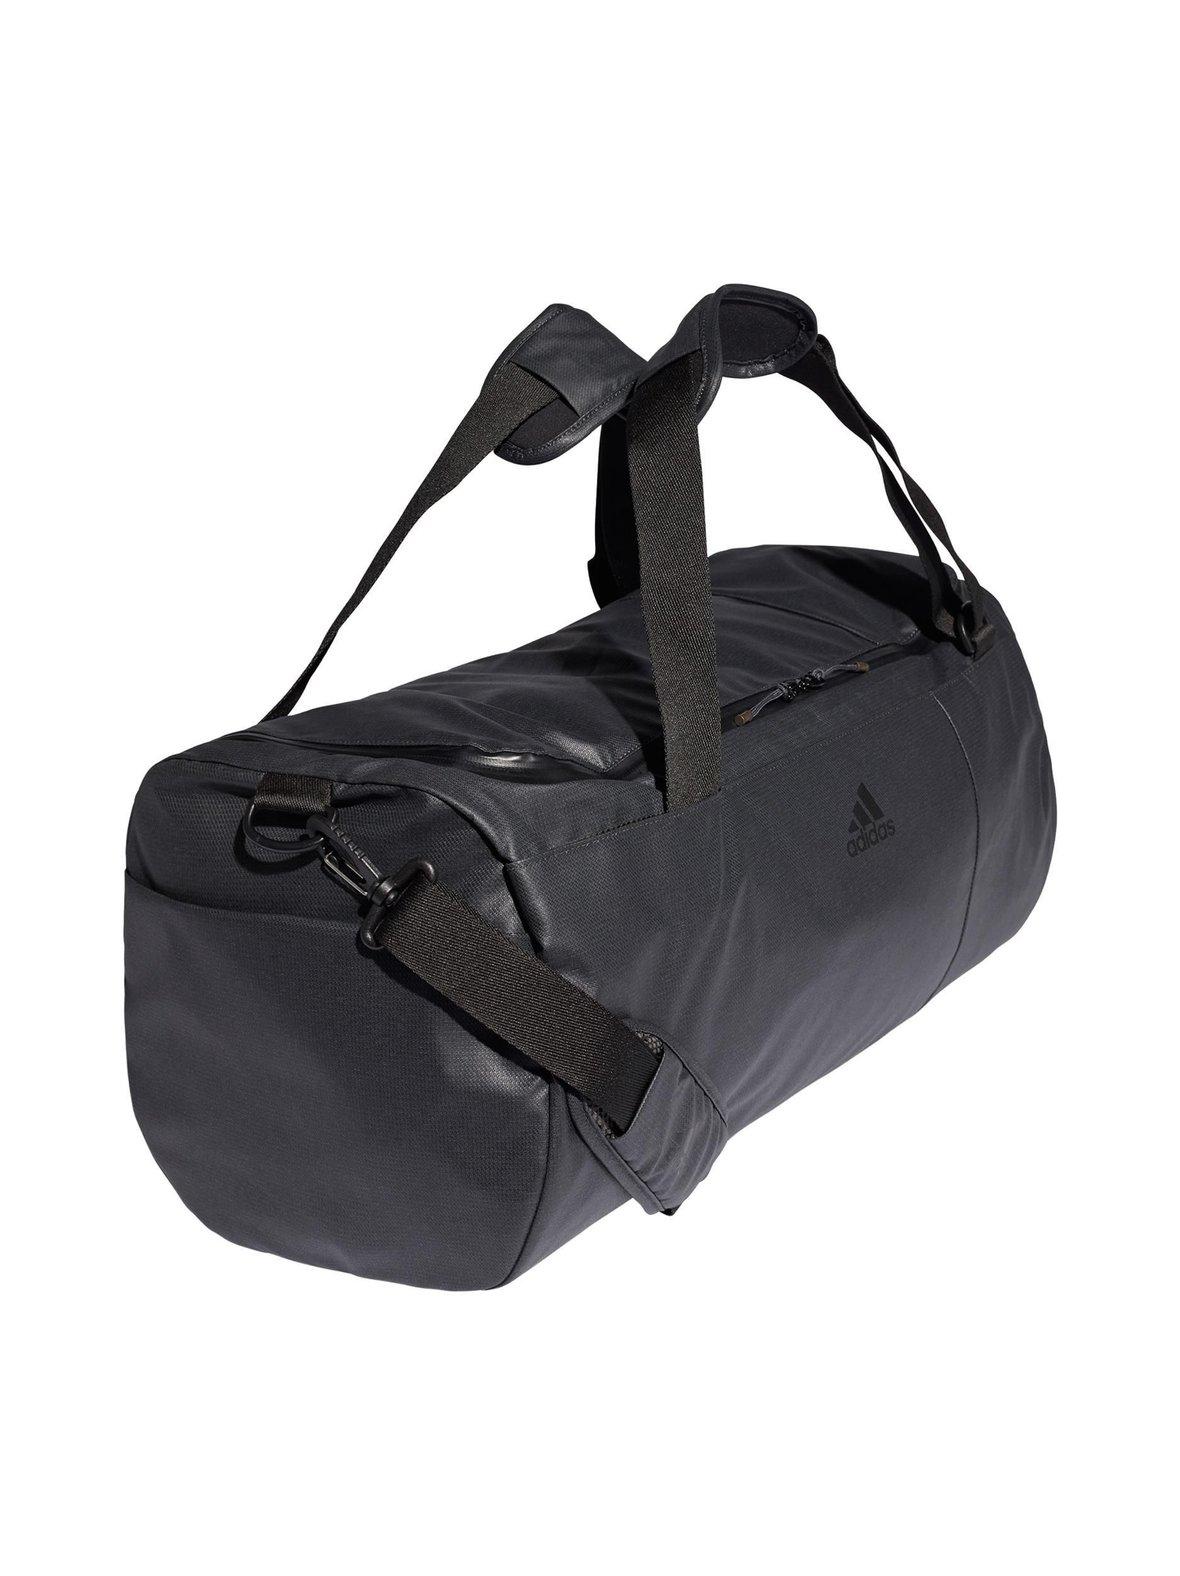 Carbon (tummanharmaa) Adidas Performance Convertible Training Duffel ... 9dd271300c